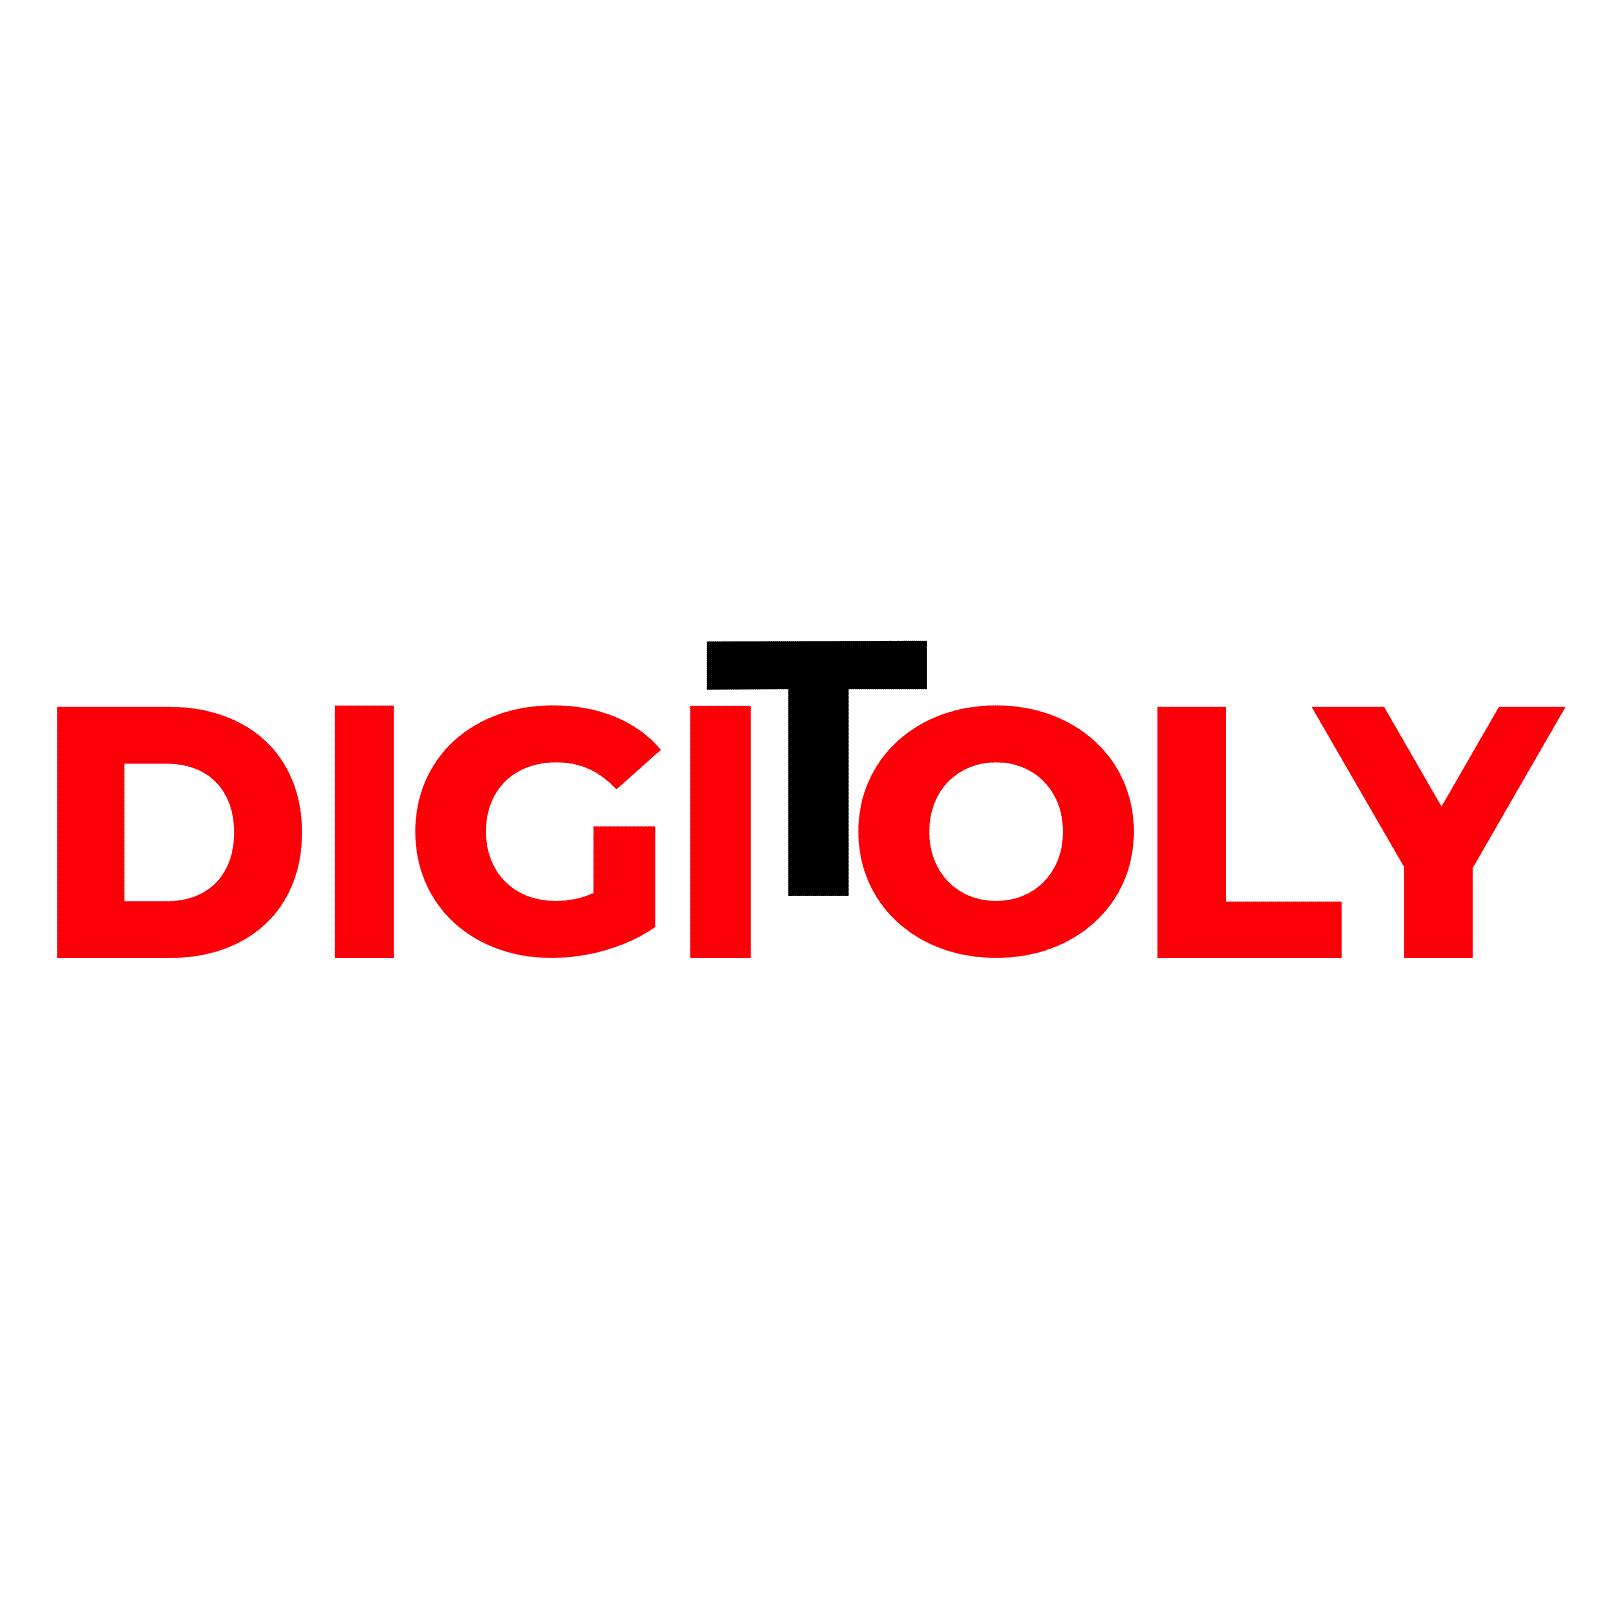 Digitoly Logo